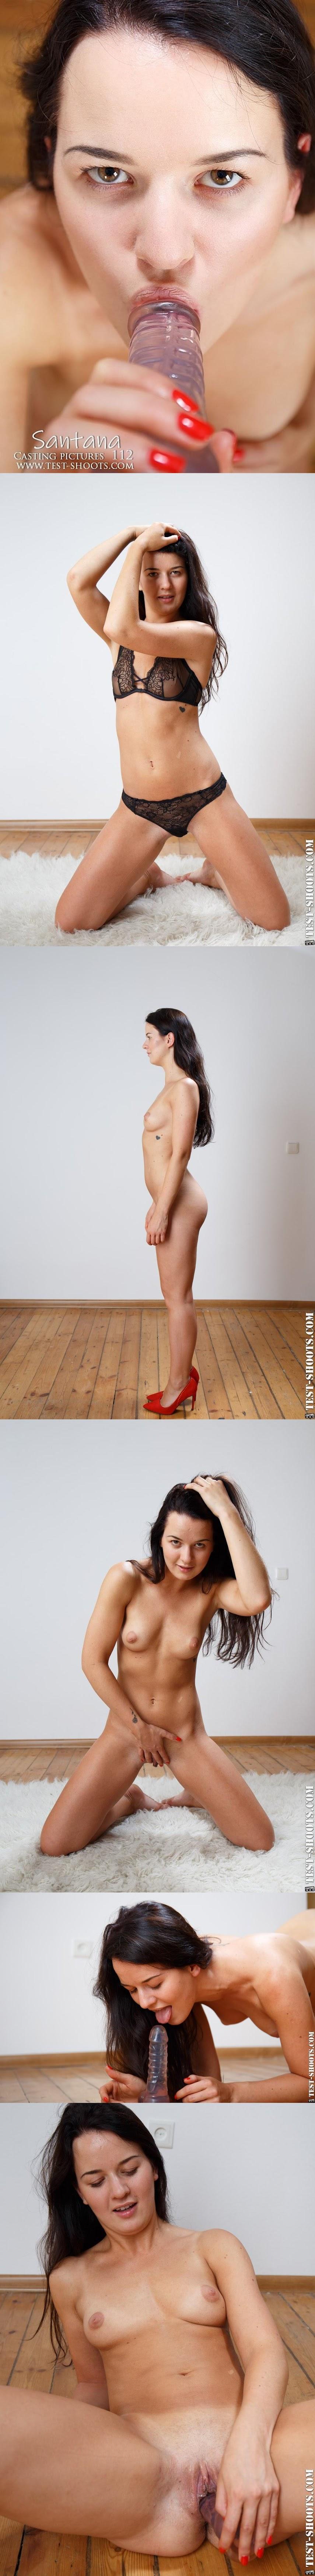 [Test-Shoot.Com] Santana - Beautiful Girl Masturbates In Nude Casting